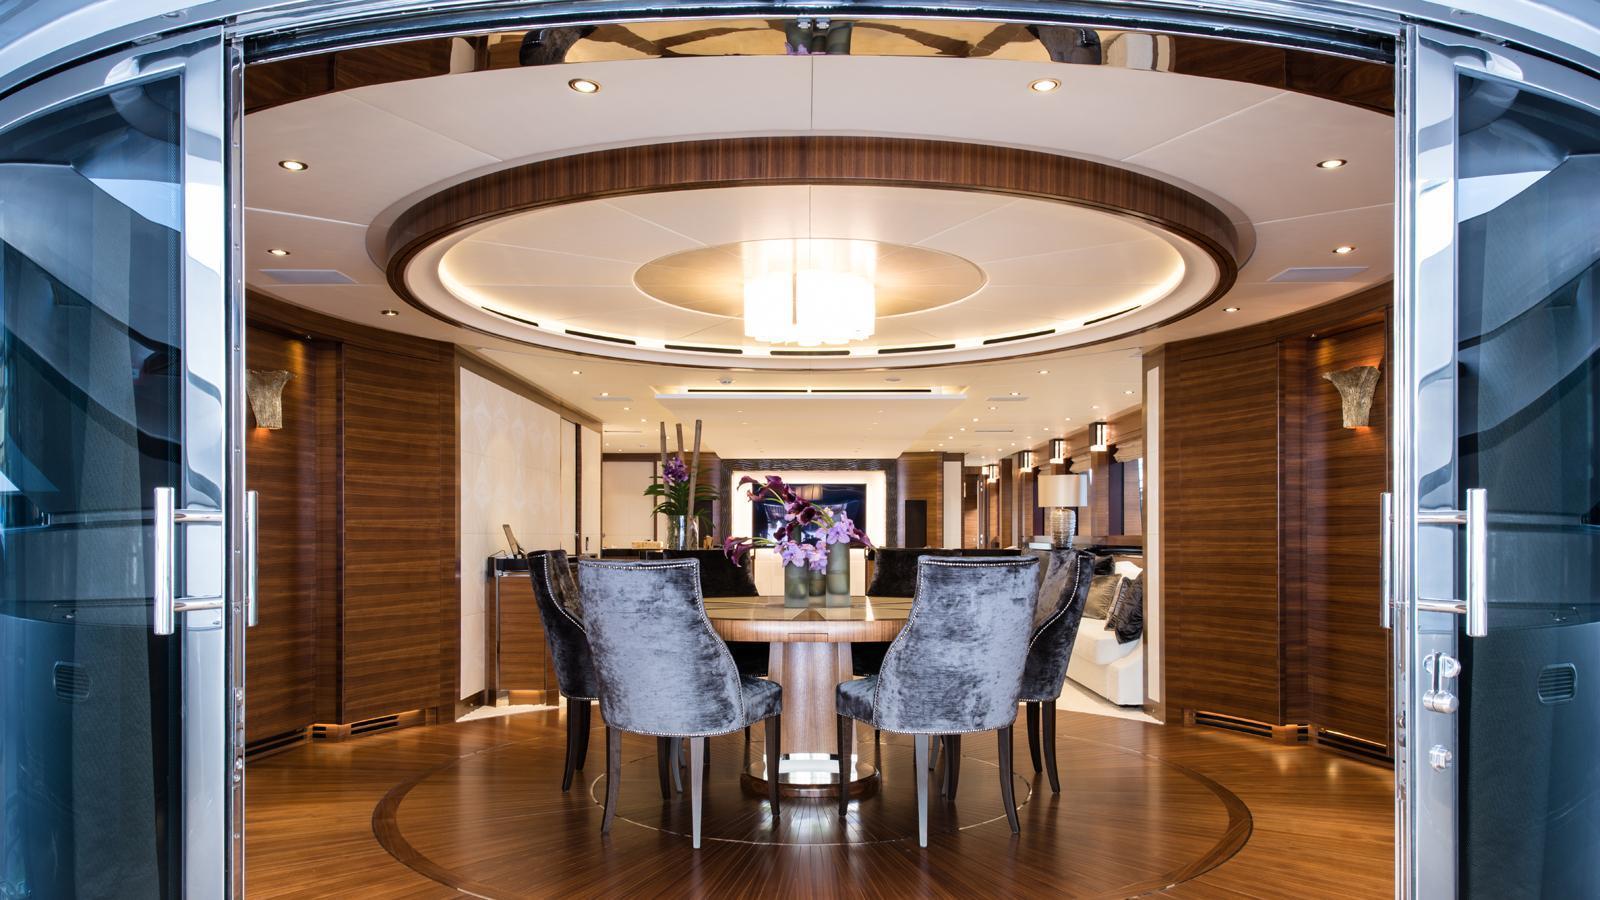 silver-wind-motor-yacht-isa-140-2014-44m-circular-dining-room